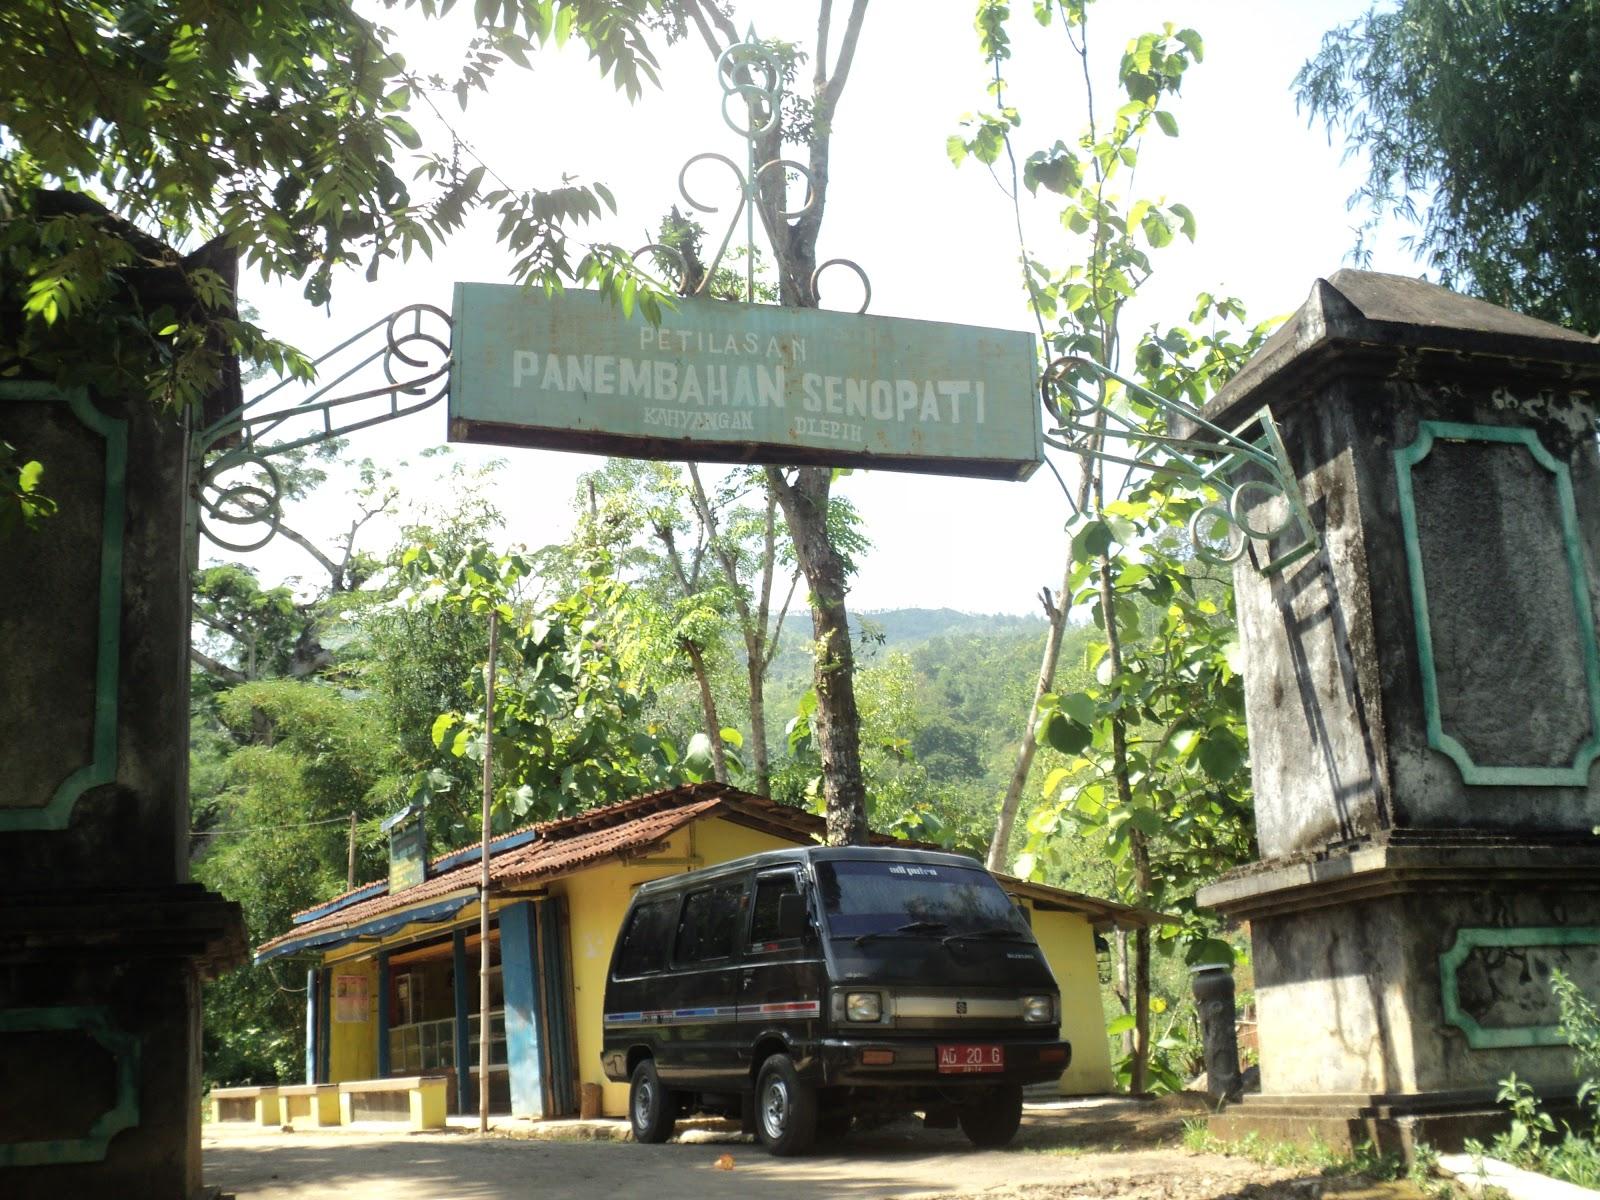 Dennys Pradita Pesona Objek Wisata Spiritial Kahyangan Tirtomoyo Wilayah Dimulai